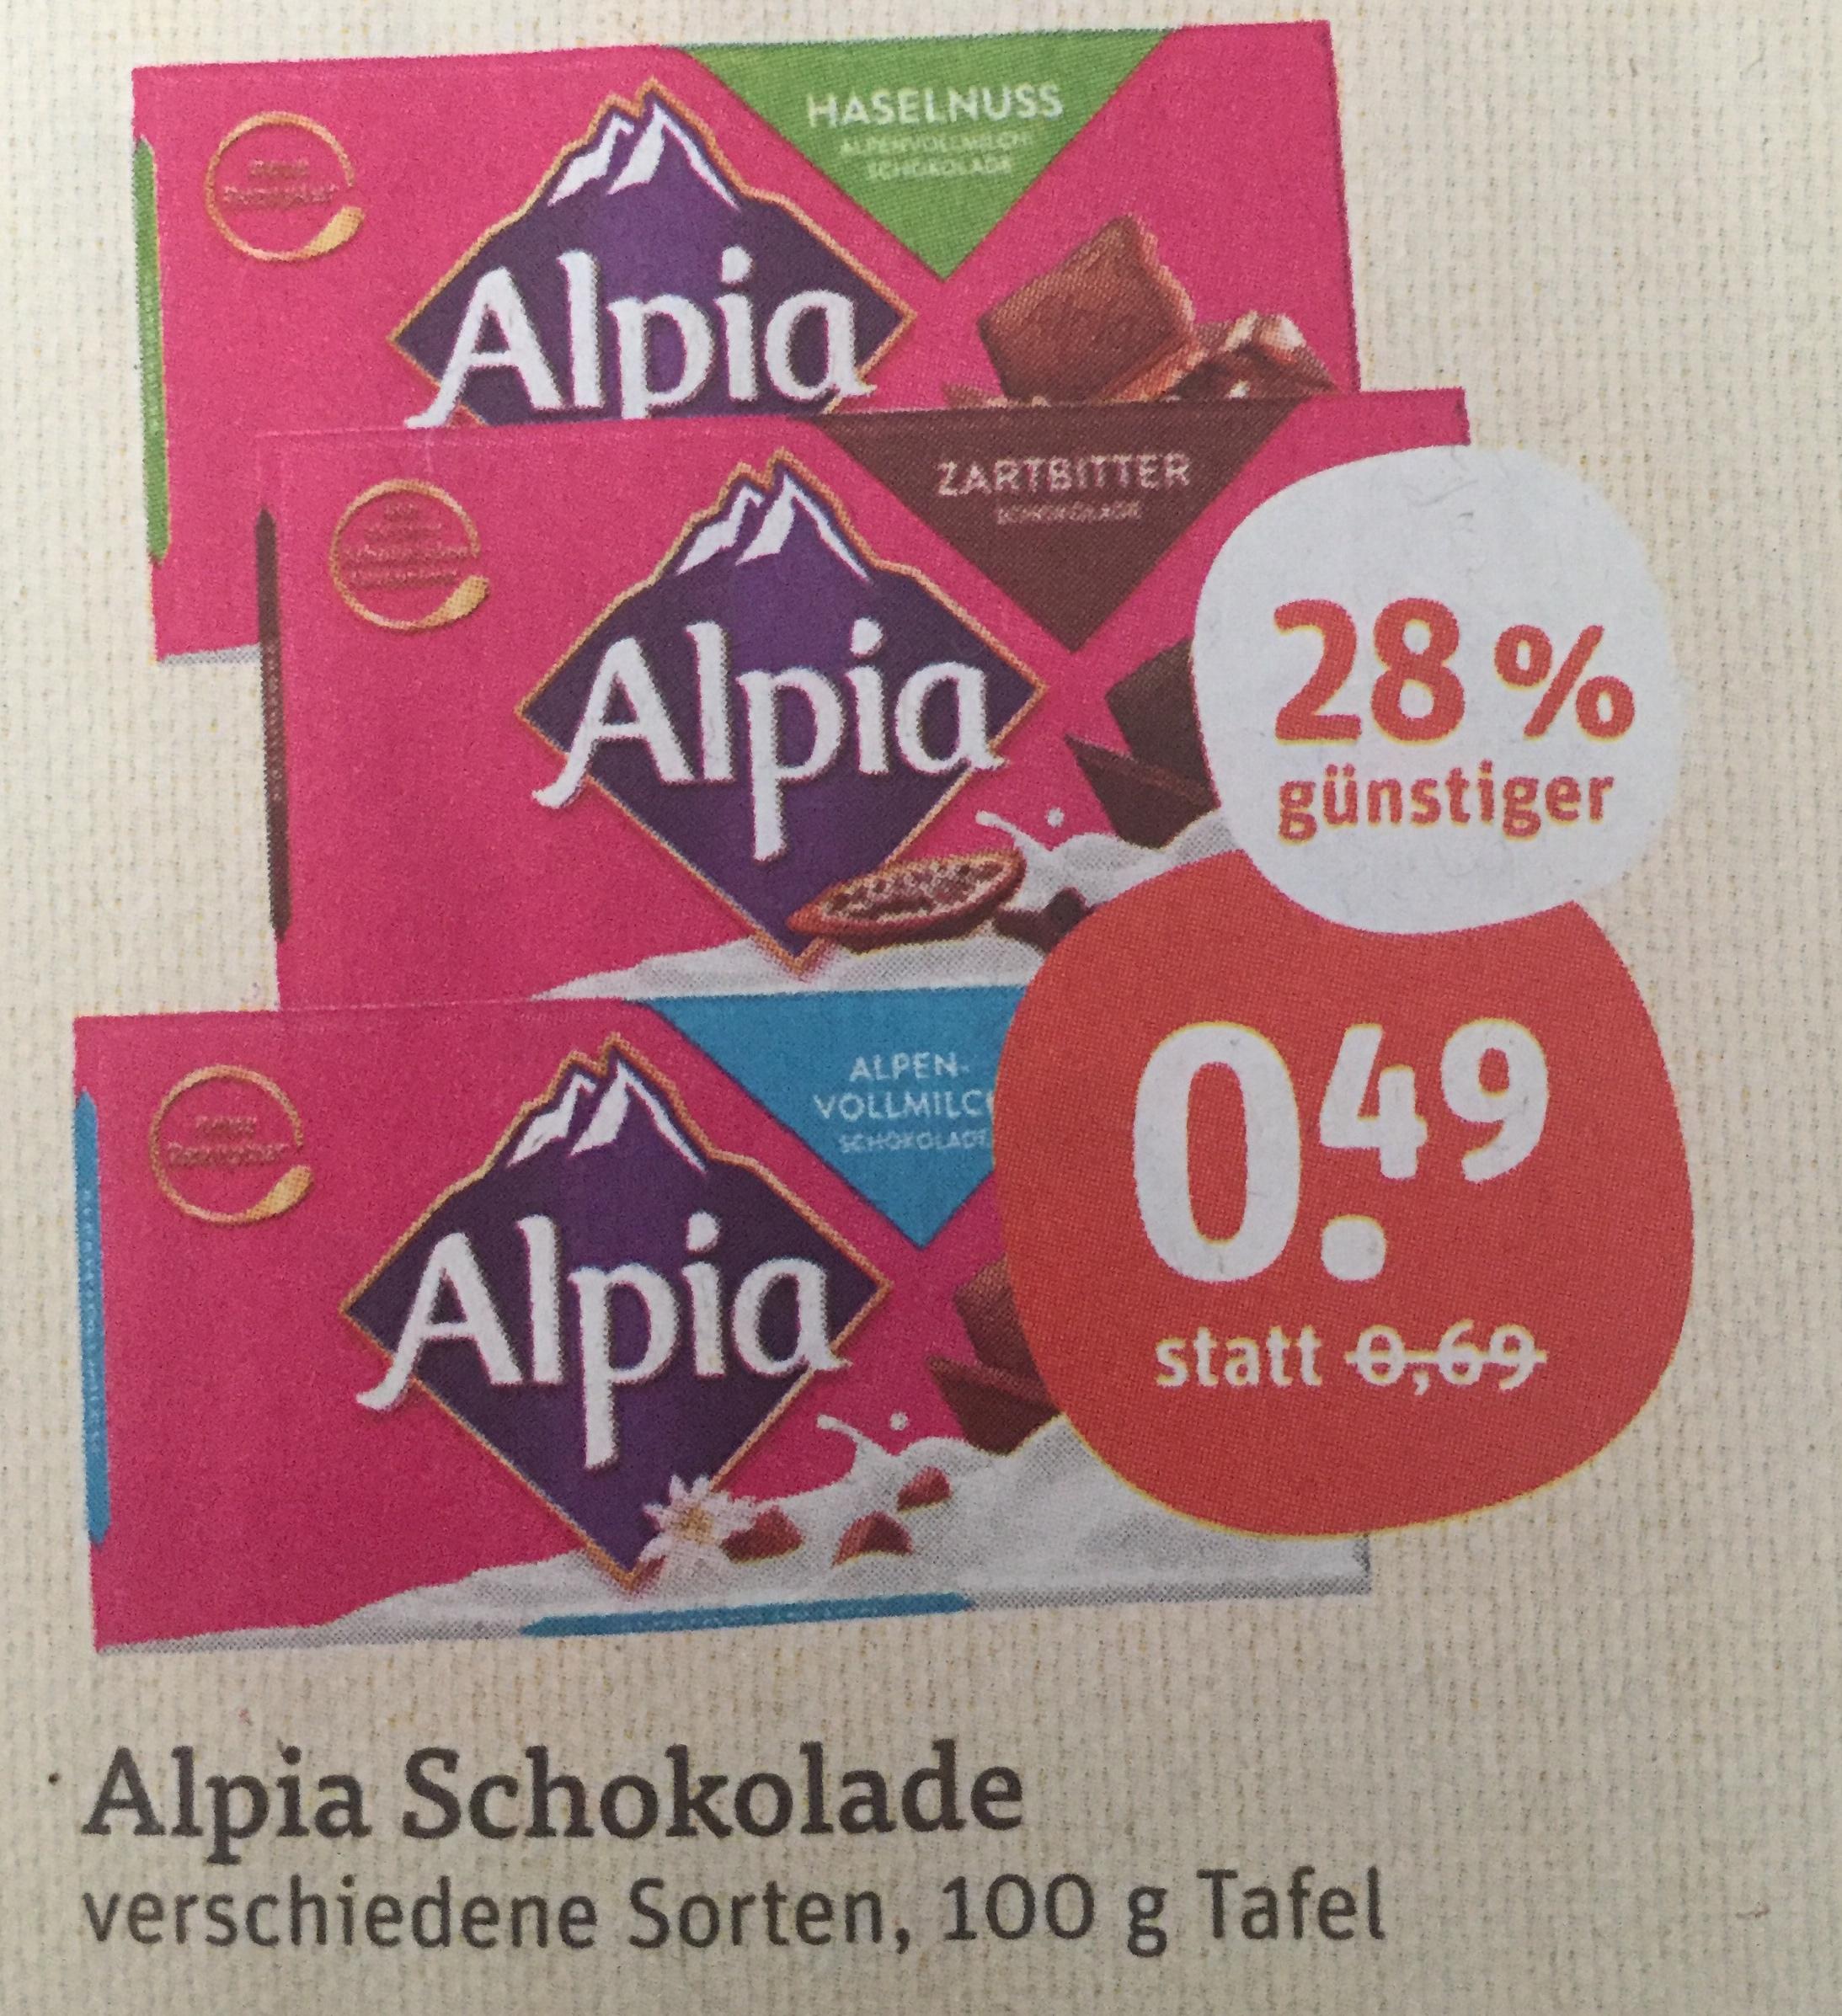 [tegut] Alpia Schokolade 100g Tafel 0,49 Euro